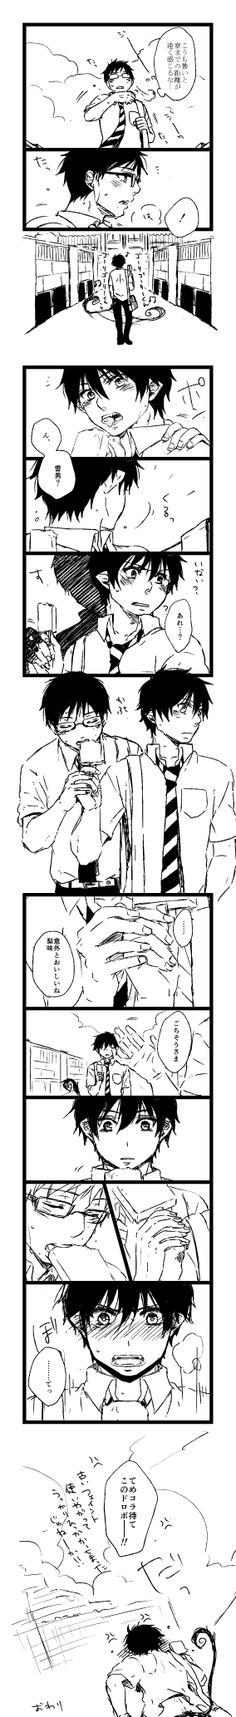 /Ao no Exorcist/#1195480 - Zerochan